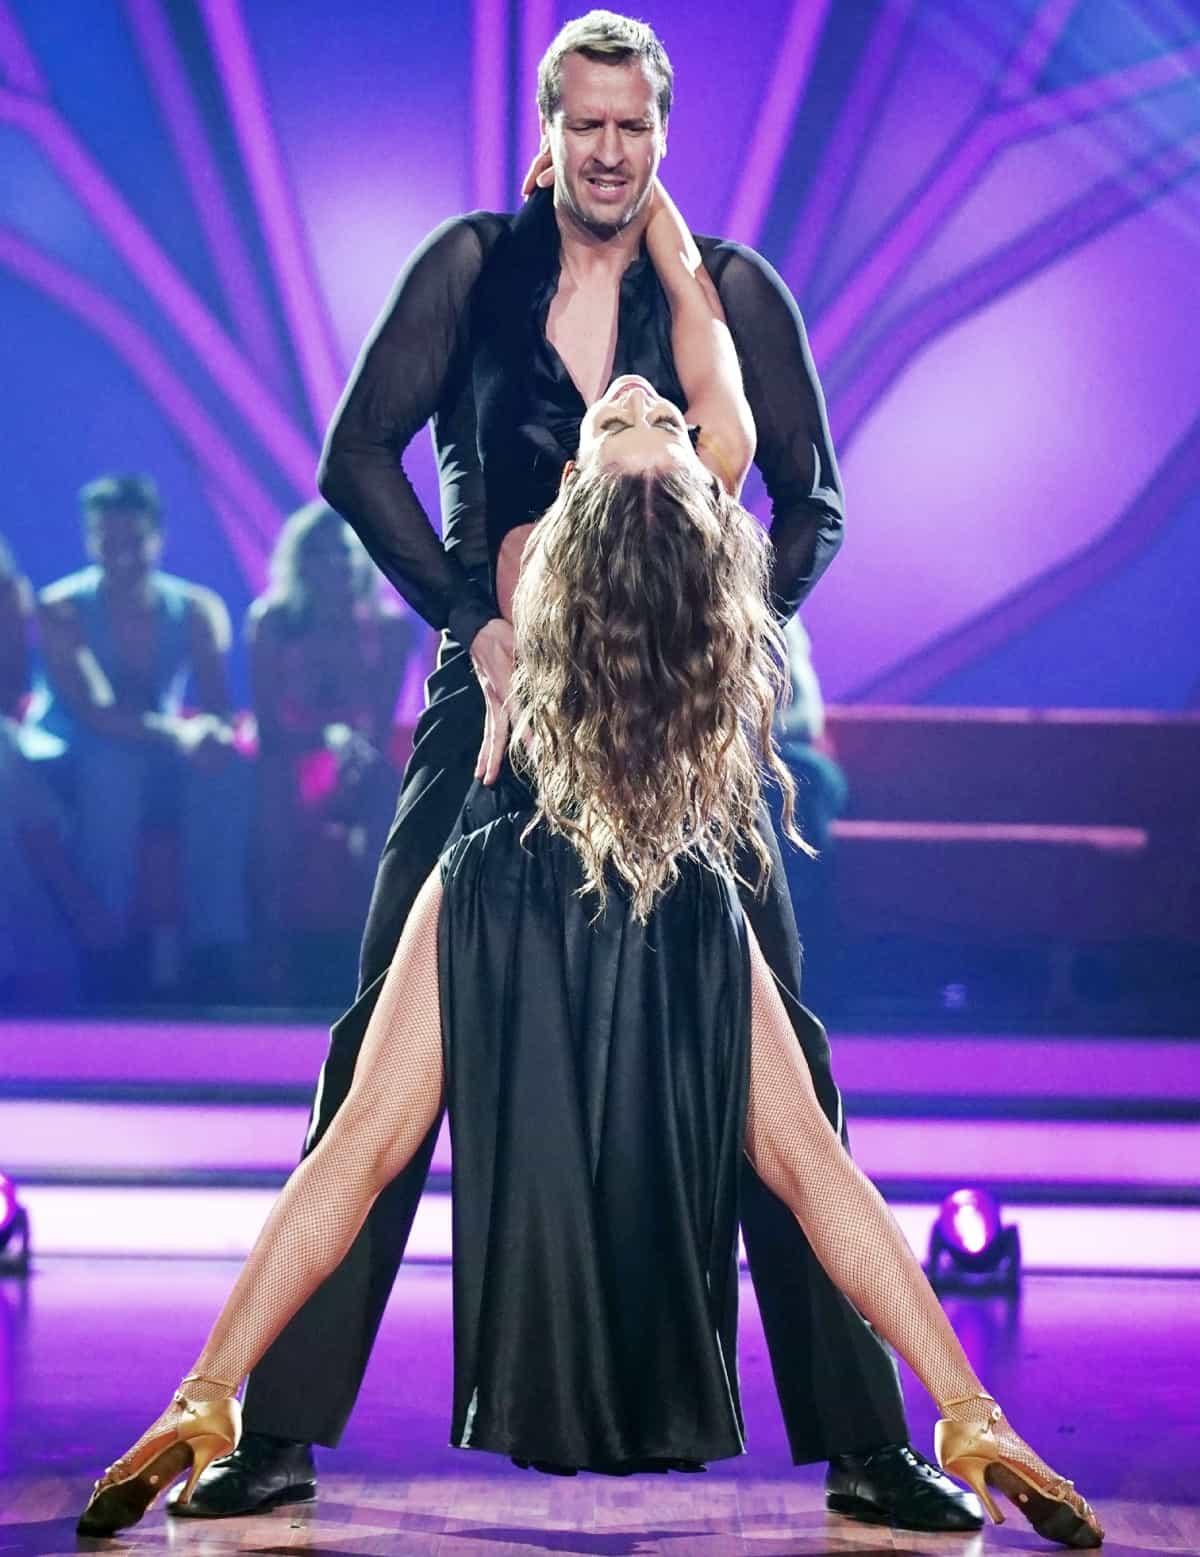 Pascal Hens - Ekaterina Leonova bei Let's dance am 7.6.2019